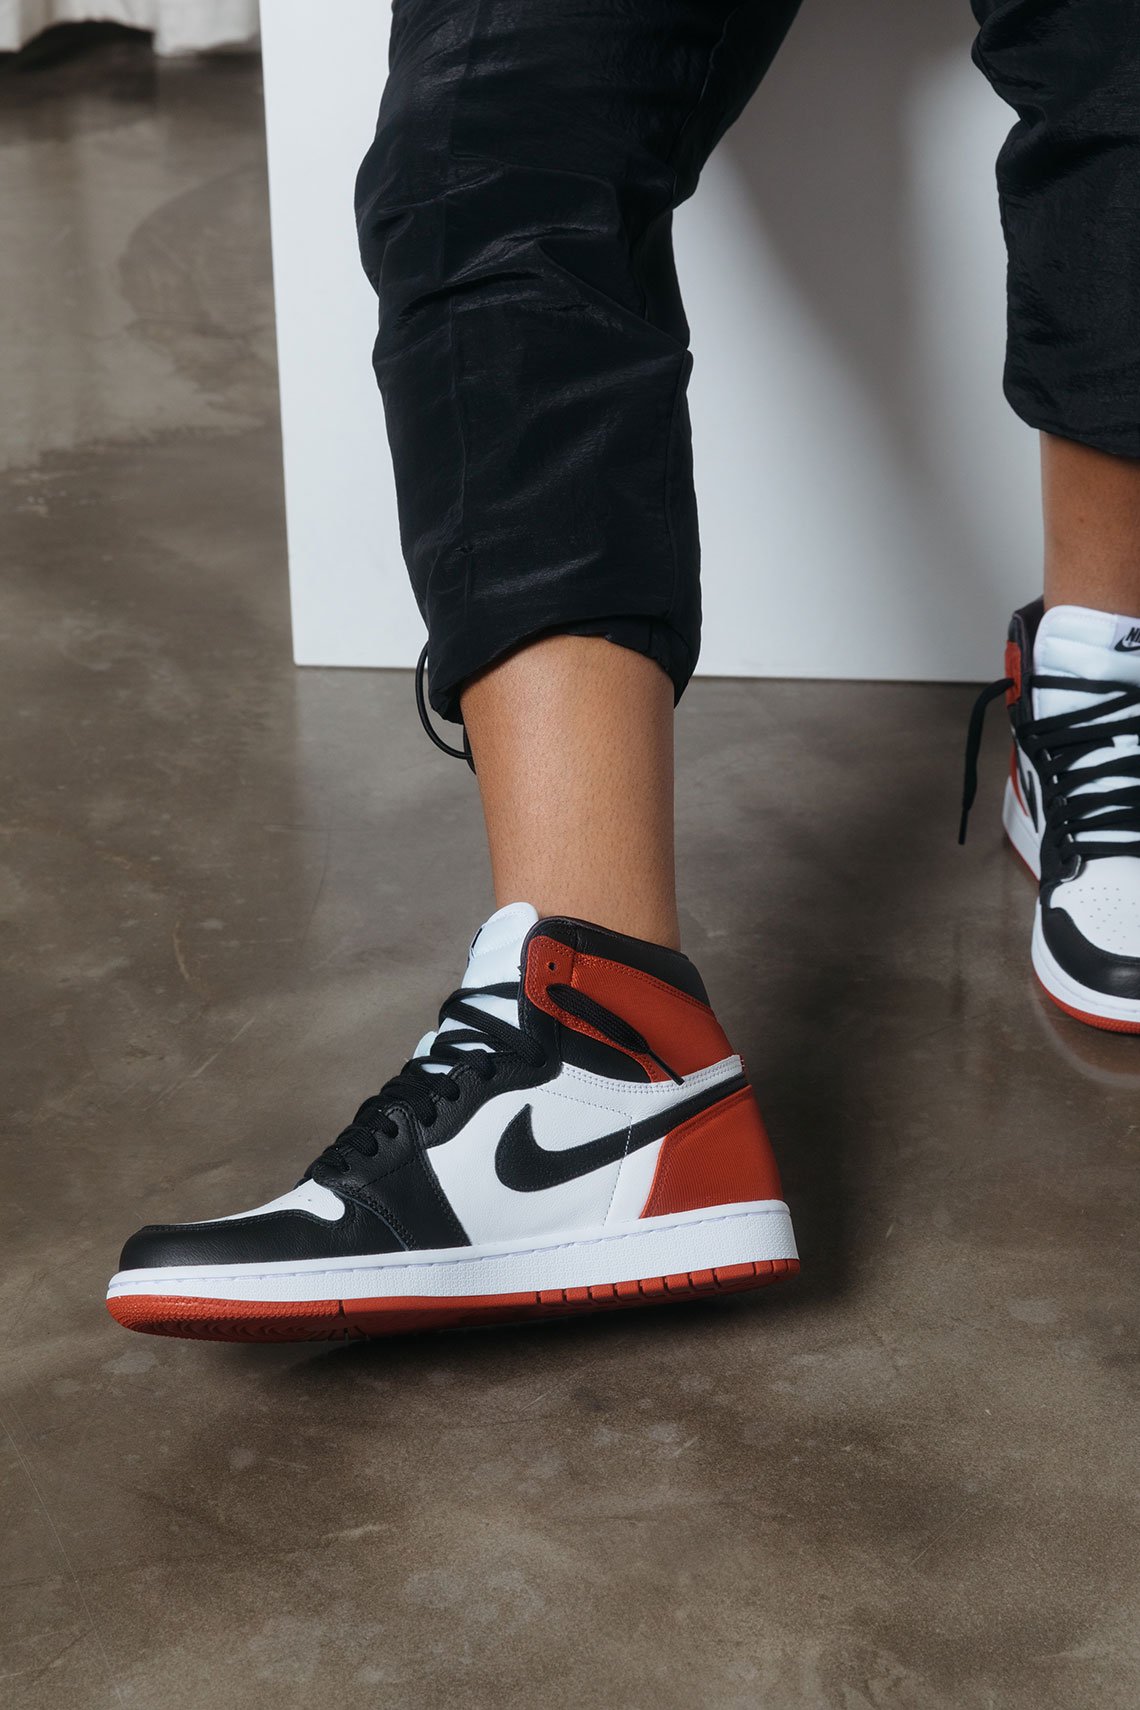 clearance sale classic outlet store sale Jordan 1 Satin Black Toe Release Date | SneakerNews.com